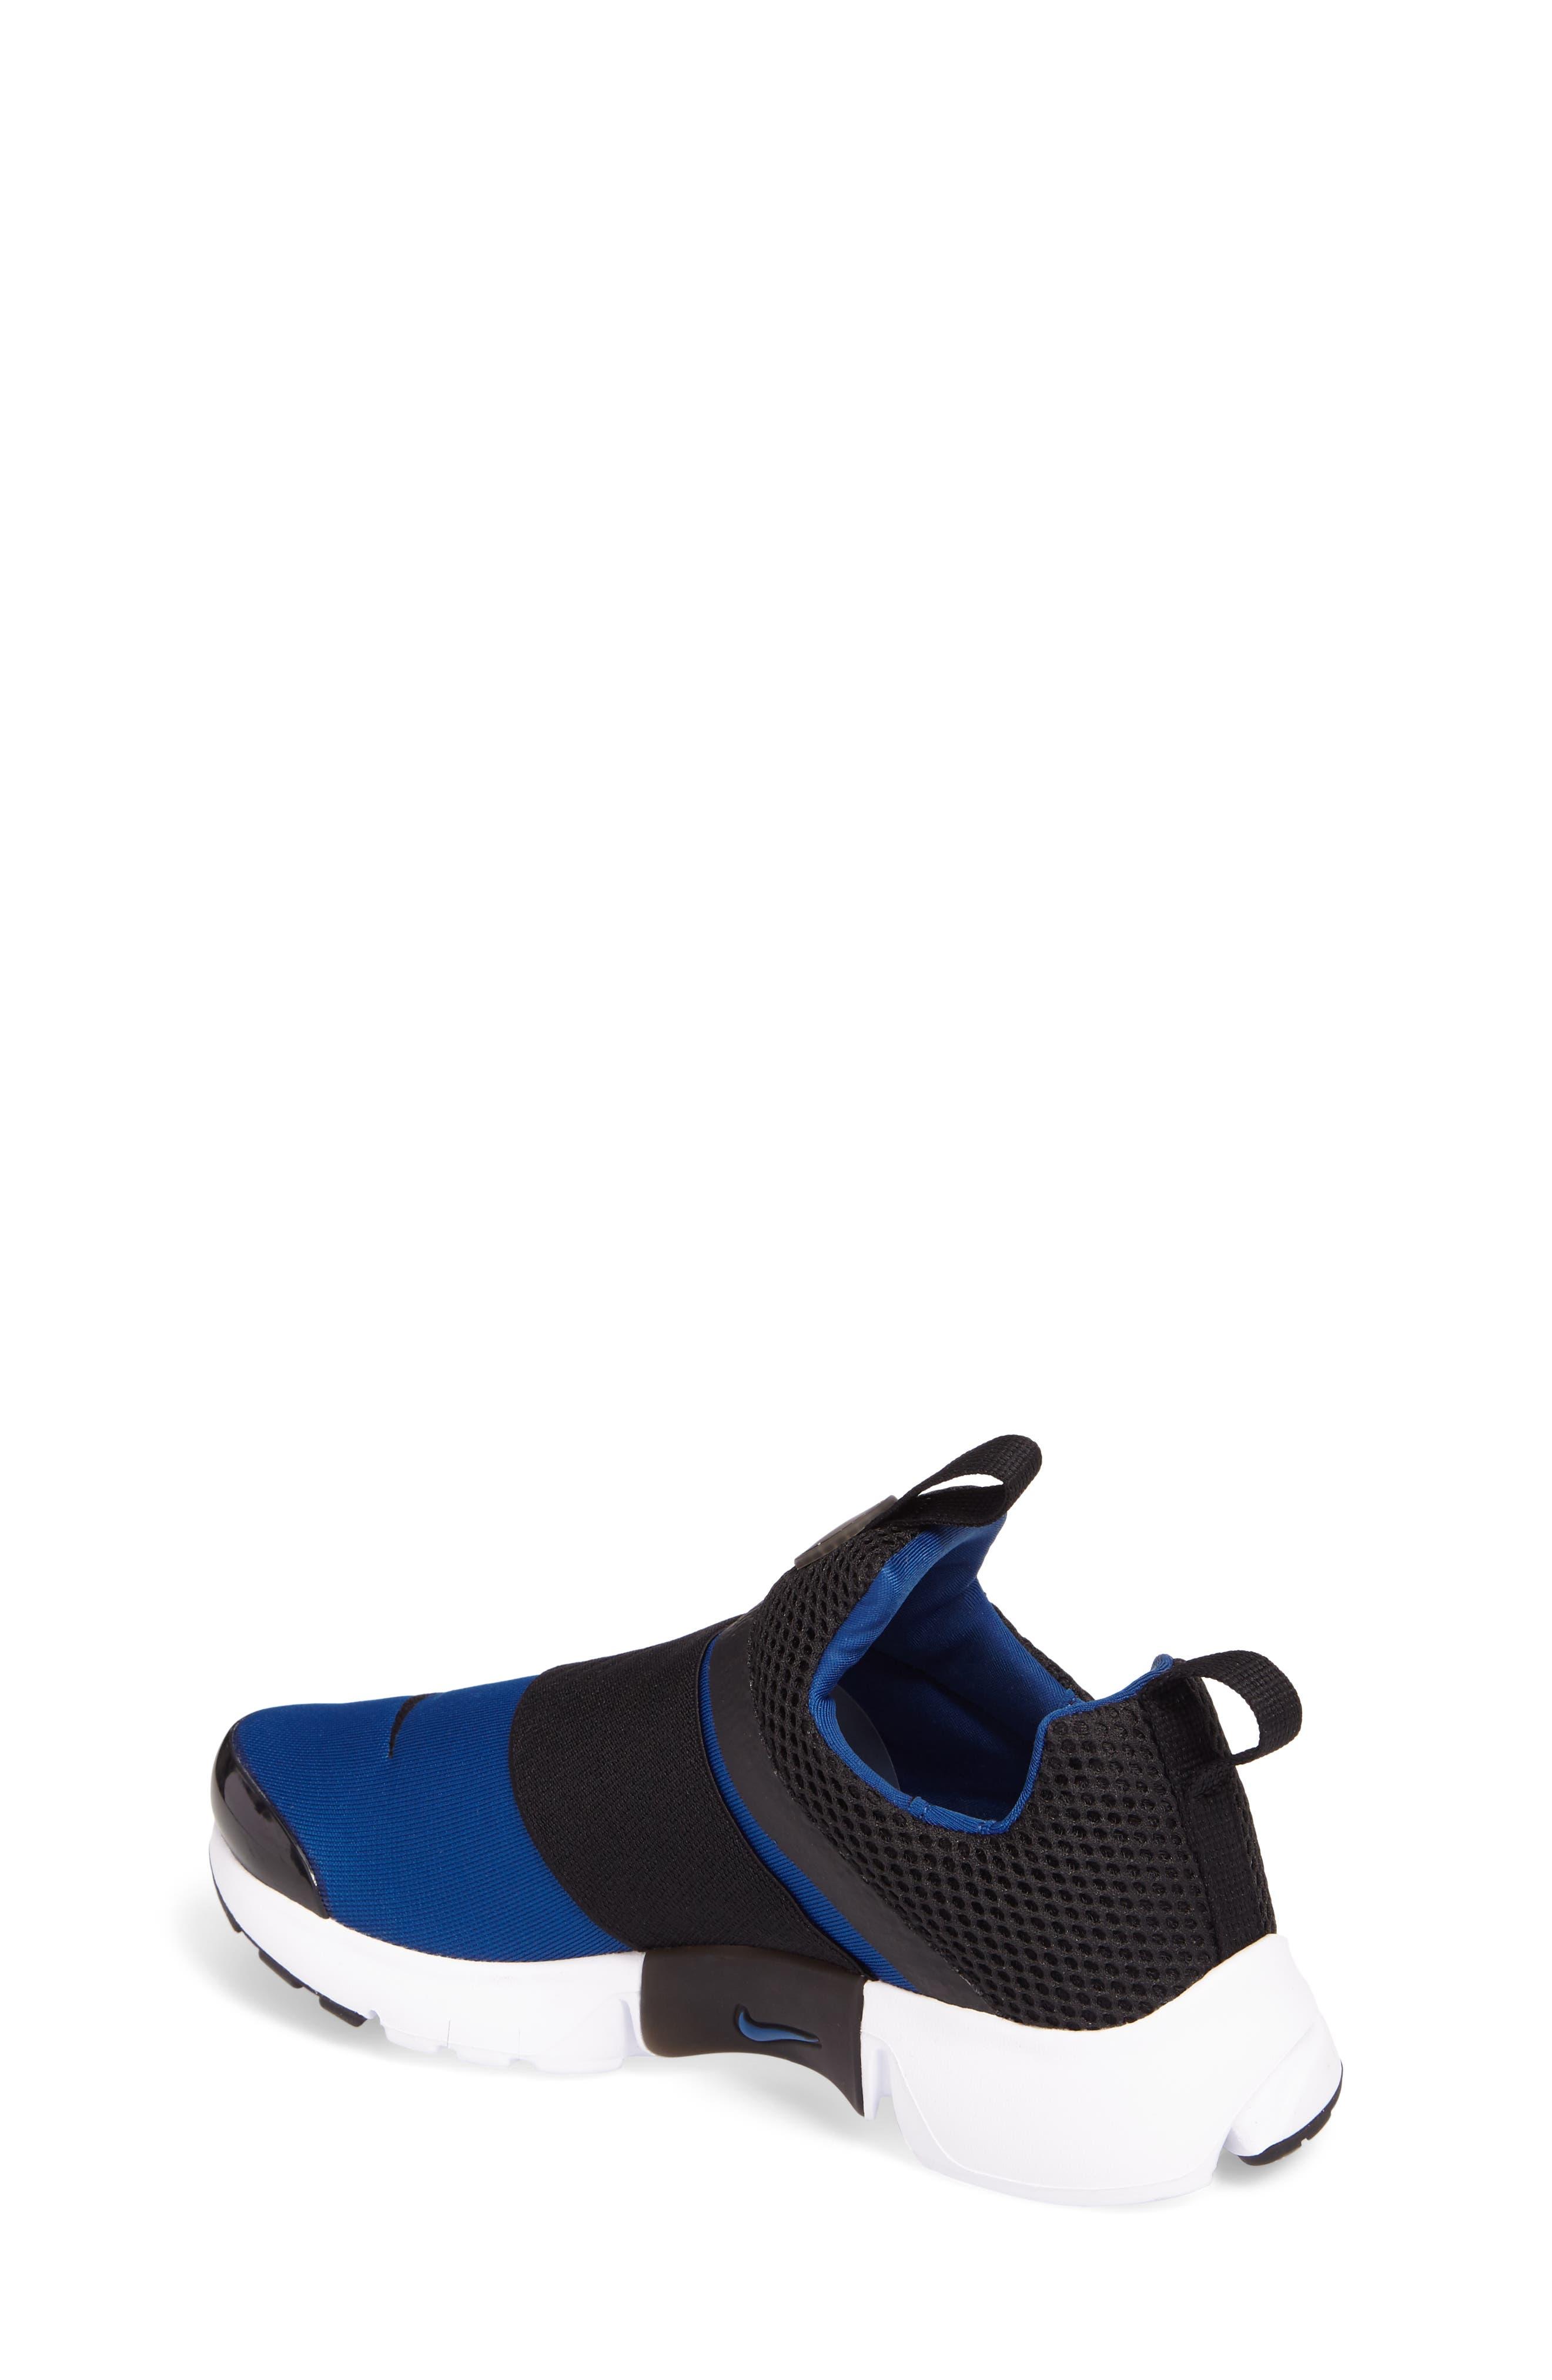 Presto Extreme Sneaker,                             Alternate thumbnail 20, color,